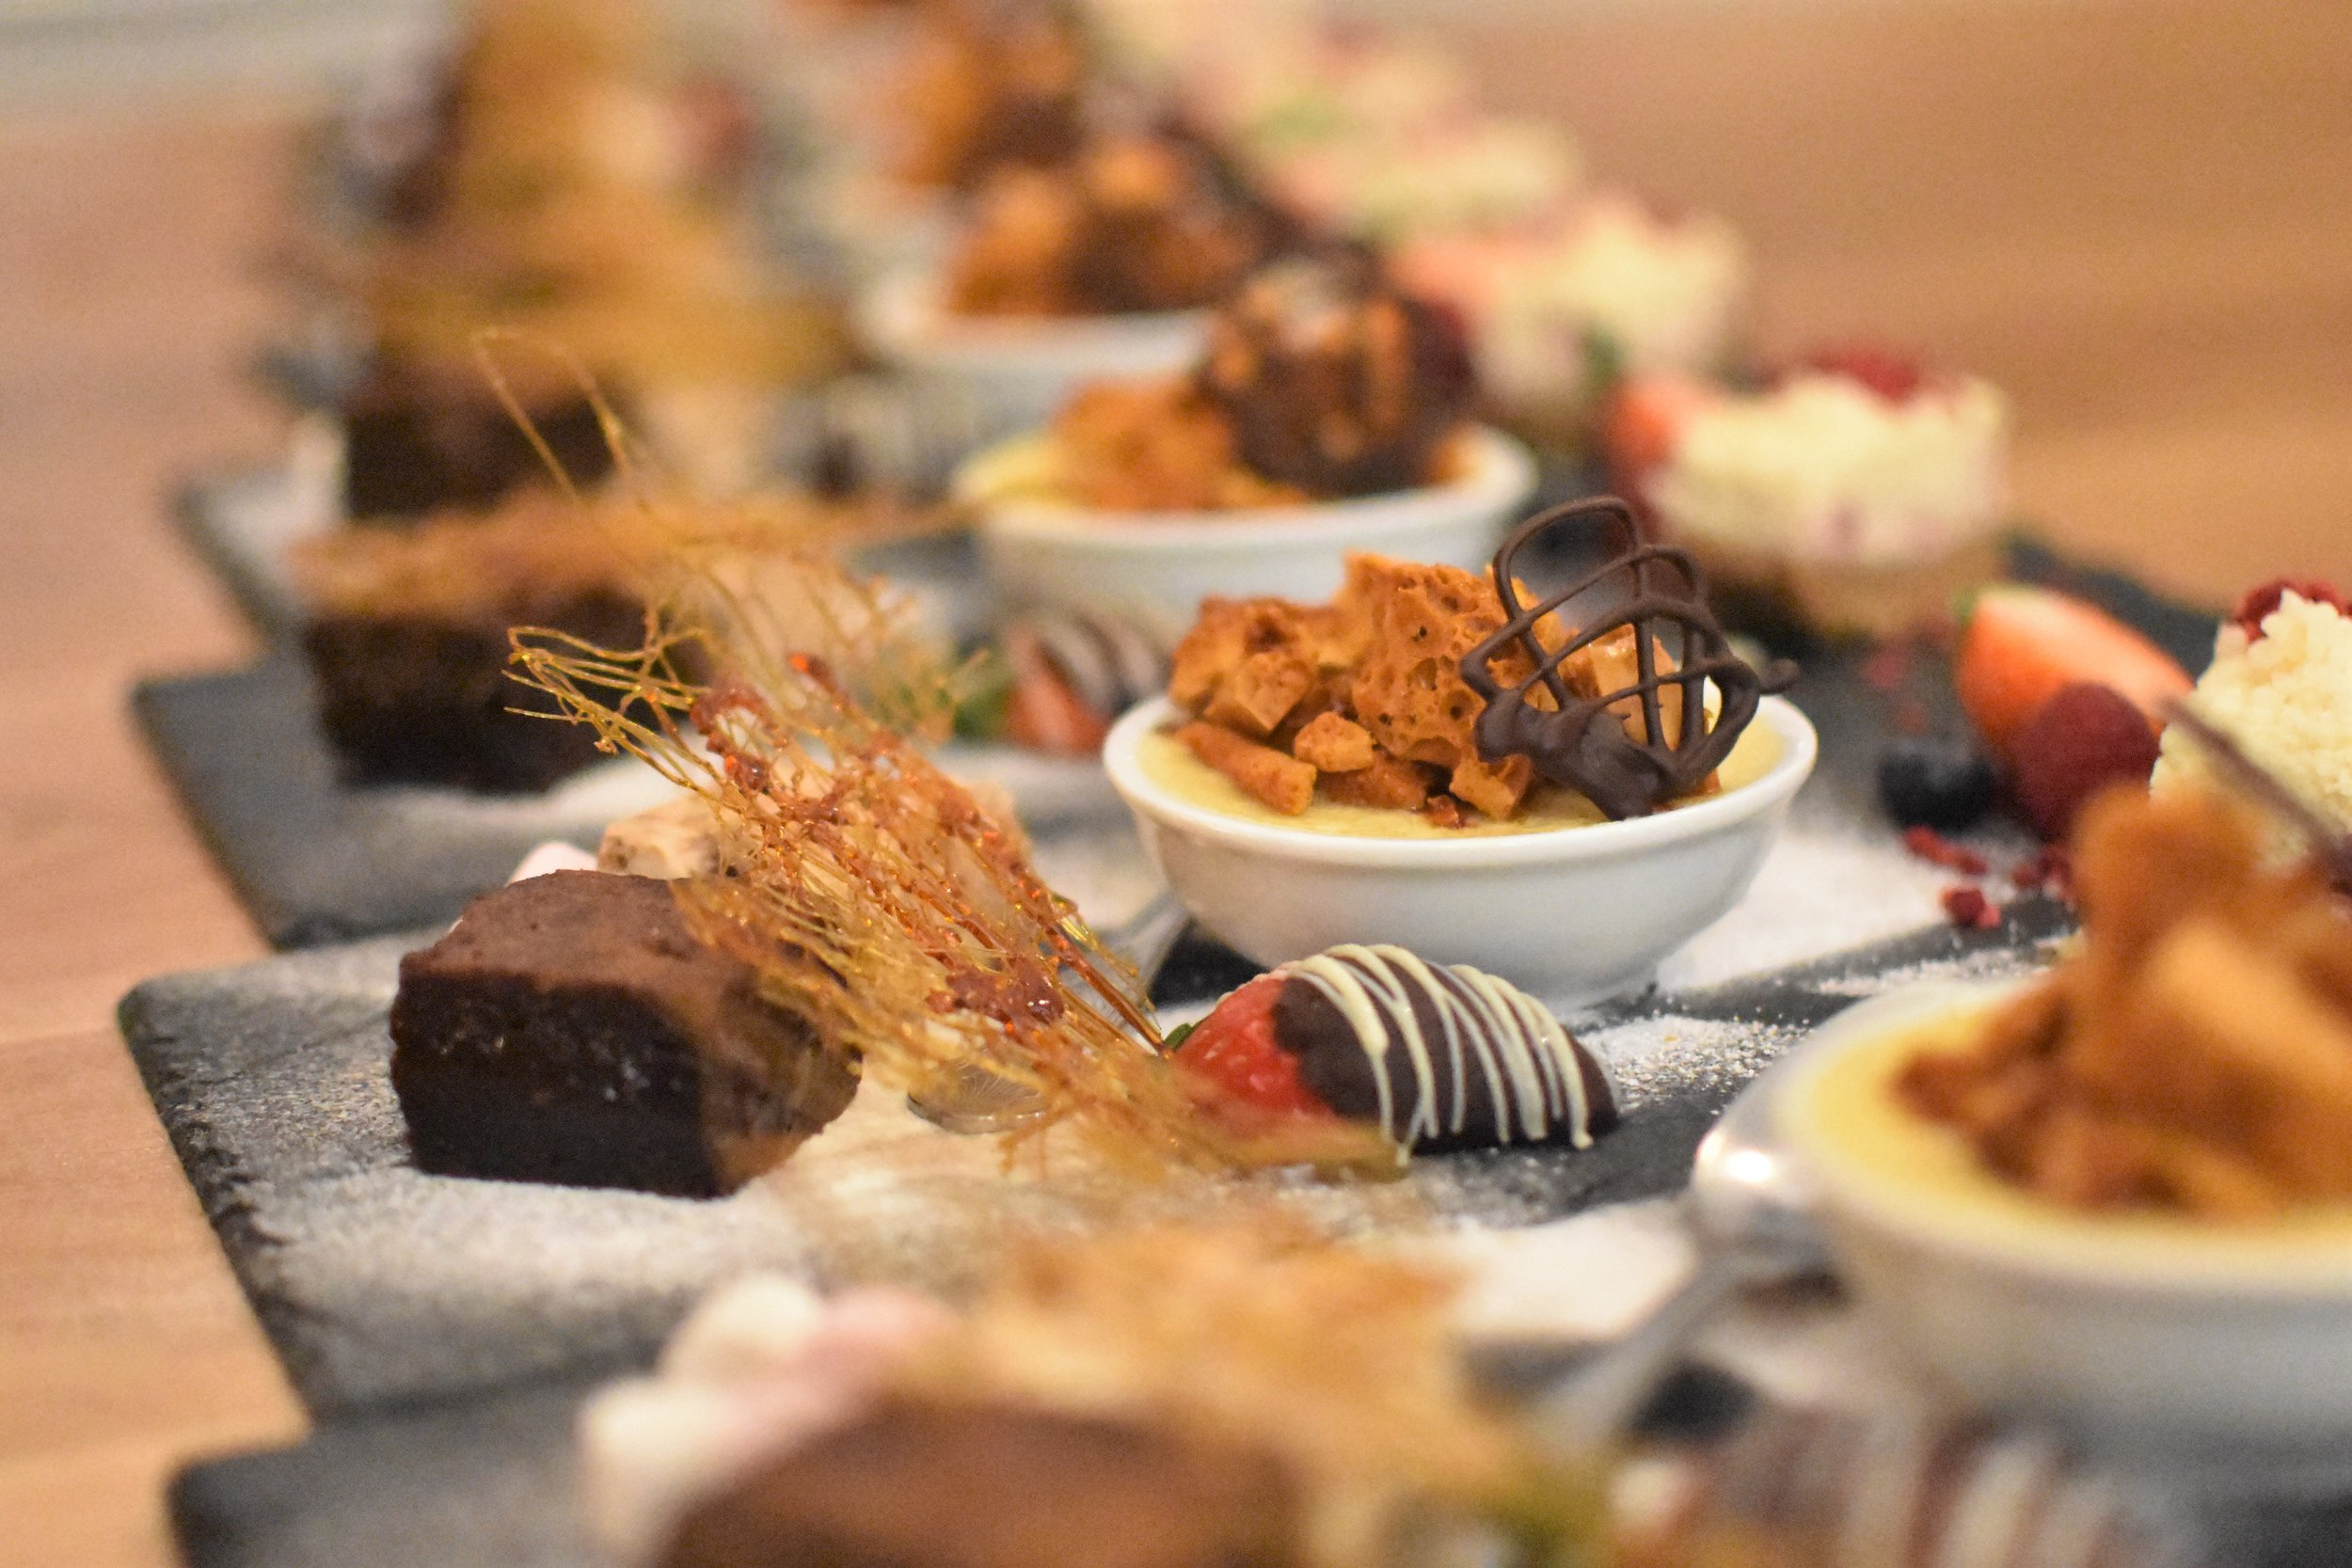 Trio of chefgary desserts